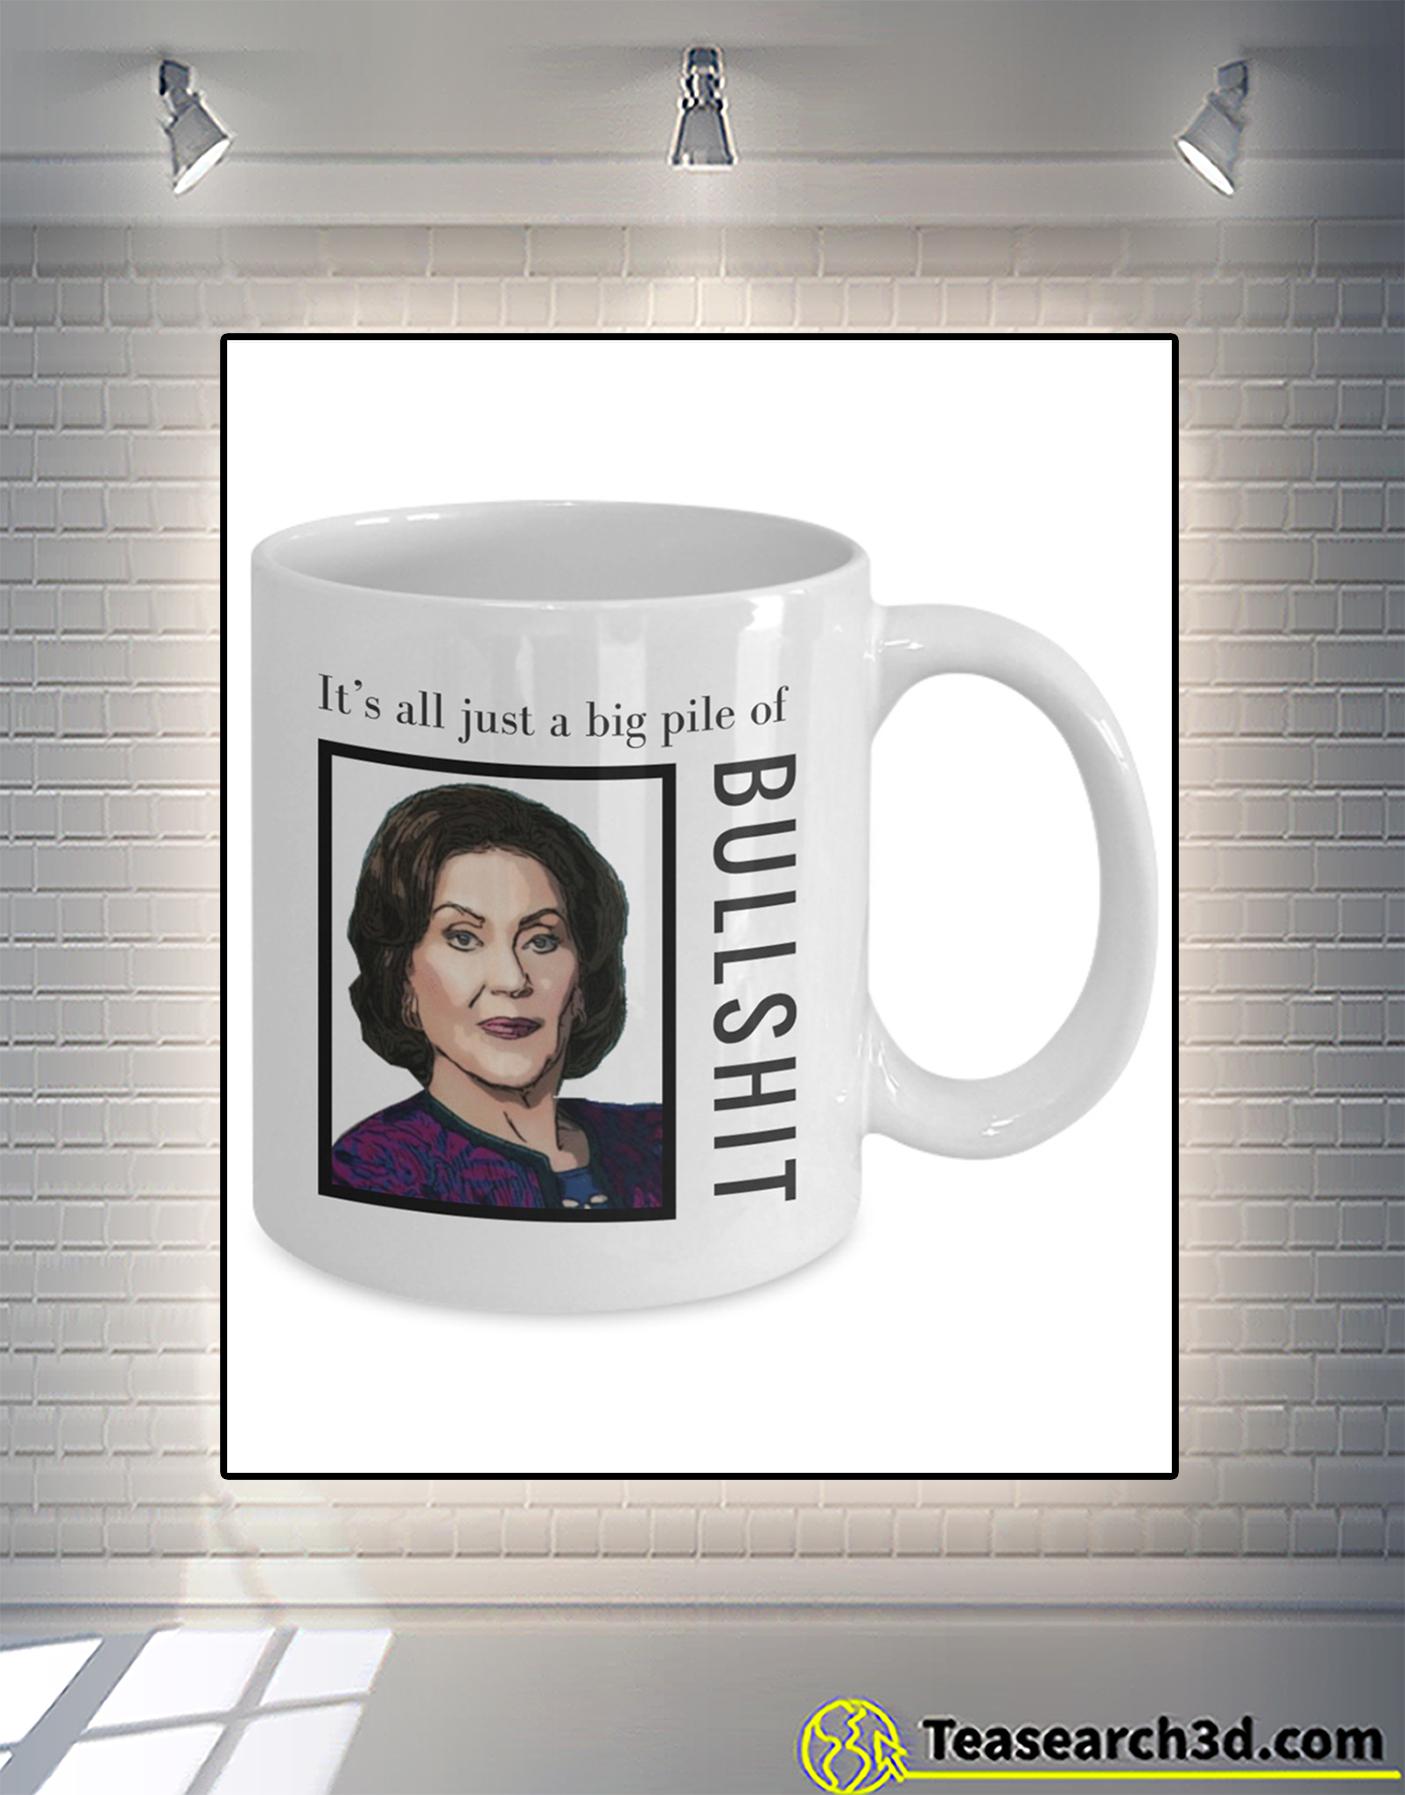 Gilmore girls It's all just a big pile of bullshit mug 1